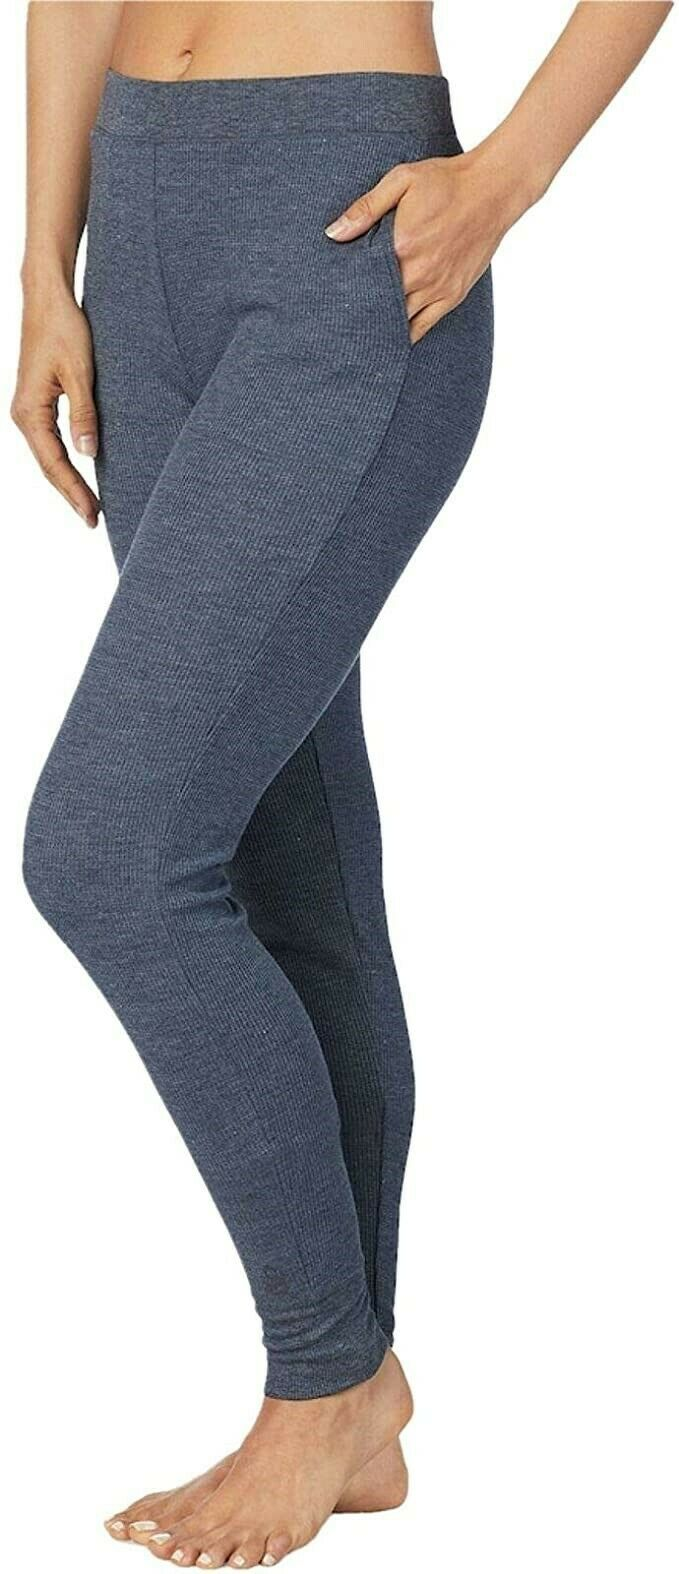 BluePlum CD2  Cuddl Duds Womens Flex Fit Long Leggings Moisture Wick Blue Plum Space Dye Small